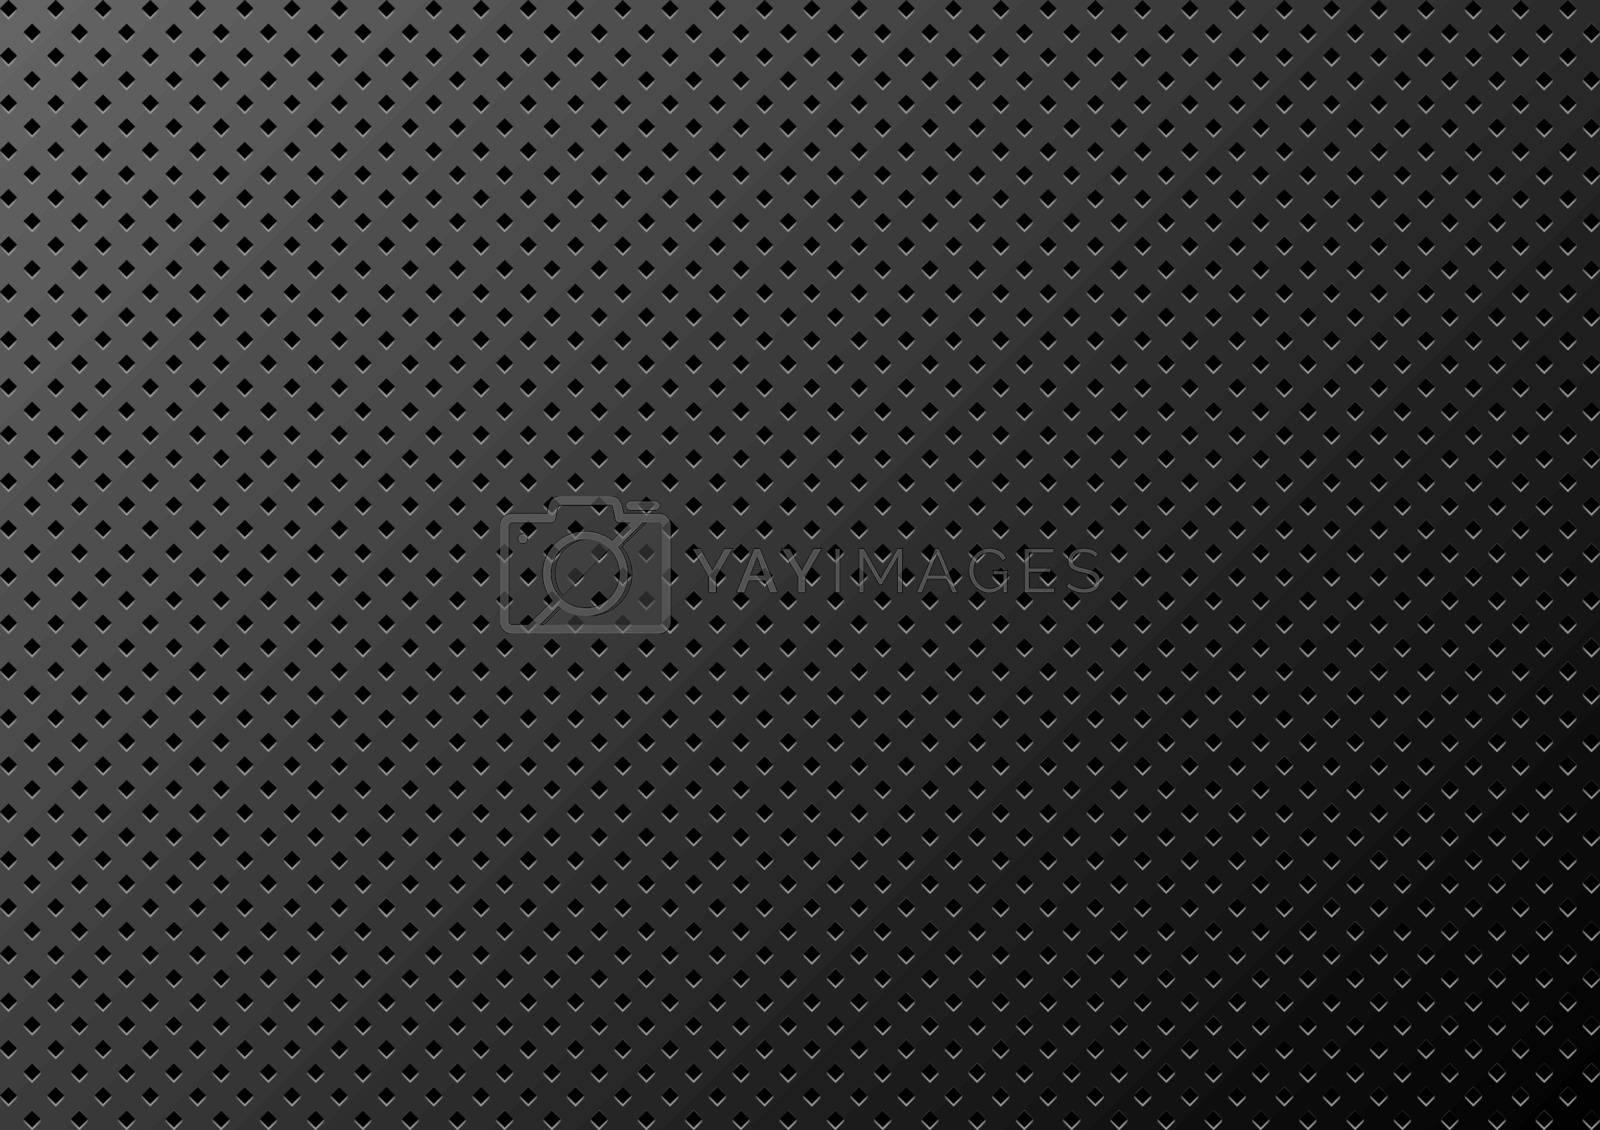 Royalty free image of Dark Metal Texture Background by illustratorCZ